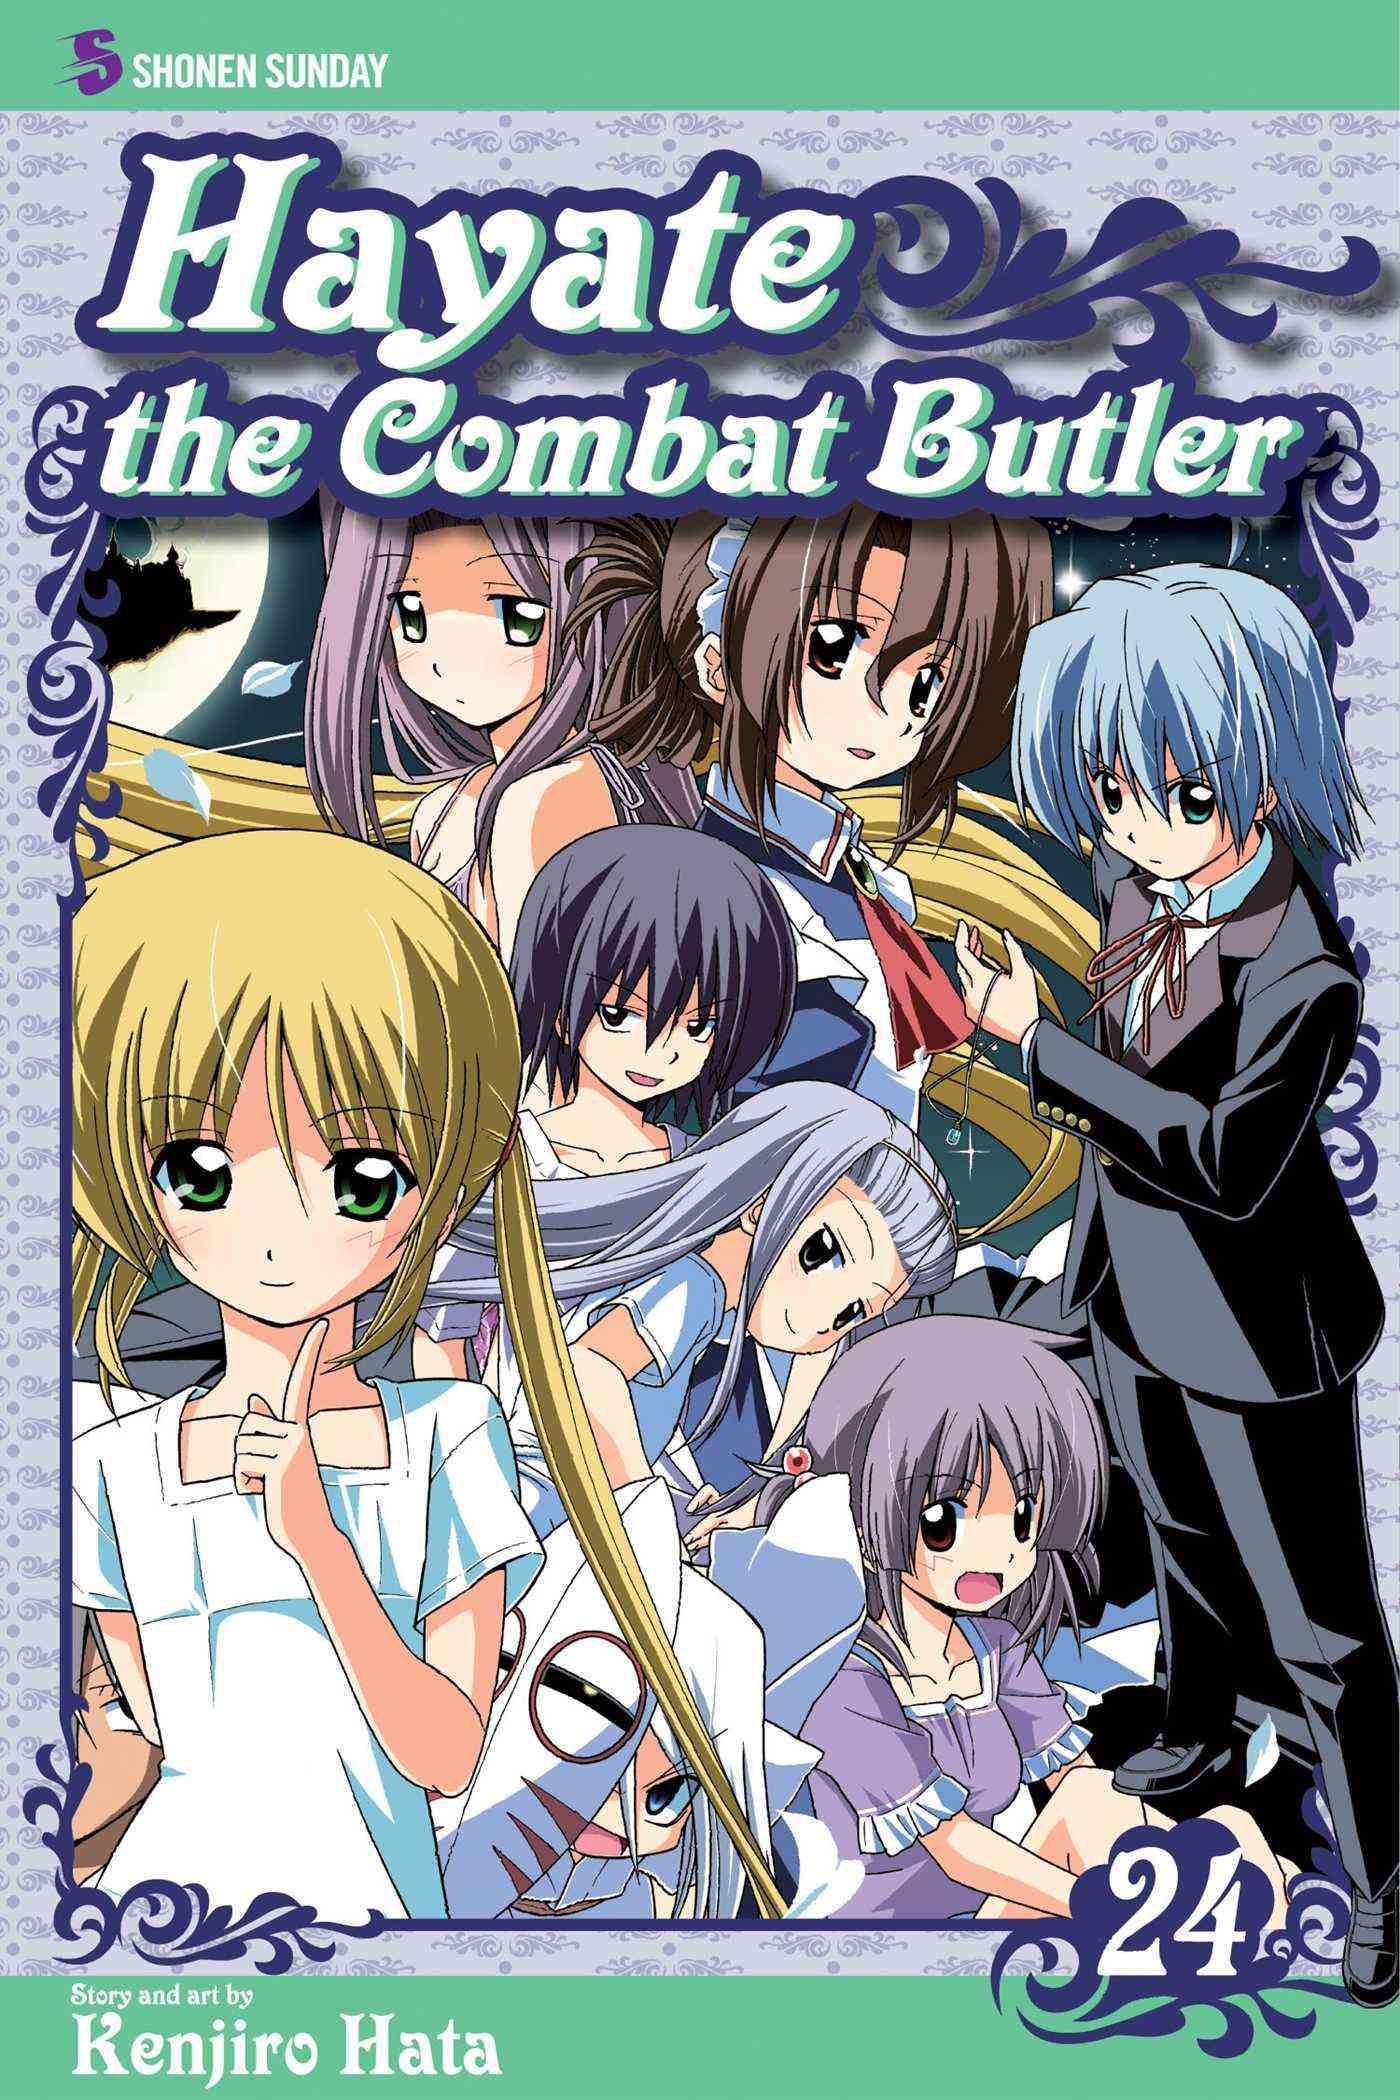 Hayate the Combat Butler 24 Shonen Sunday Edition